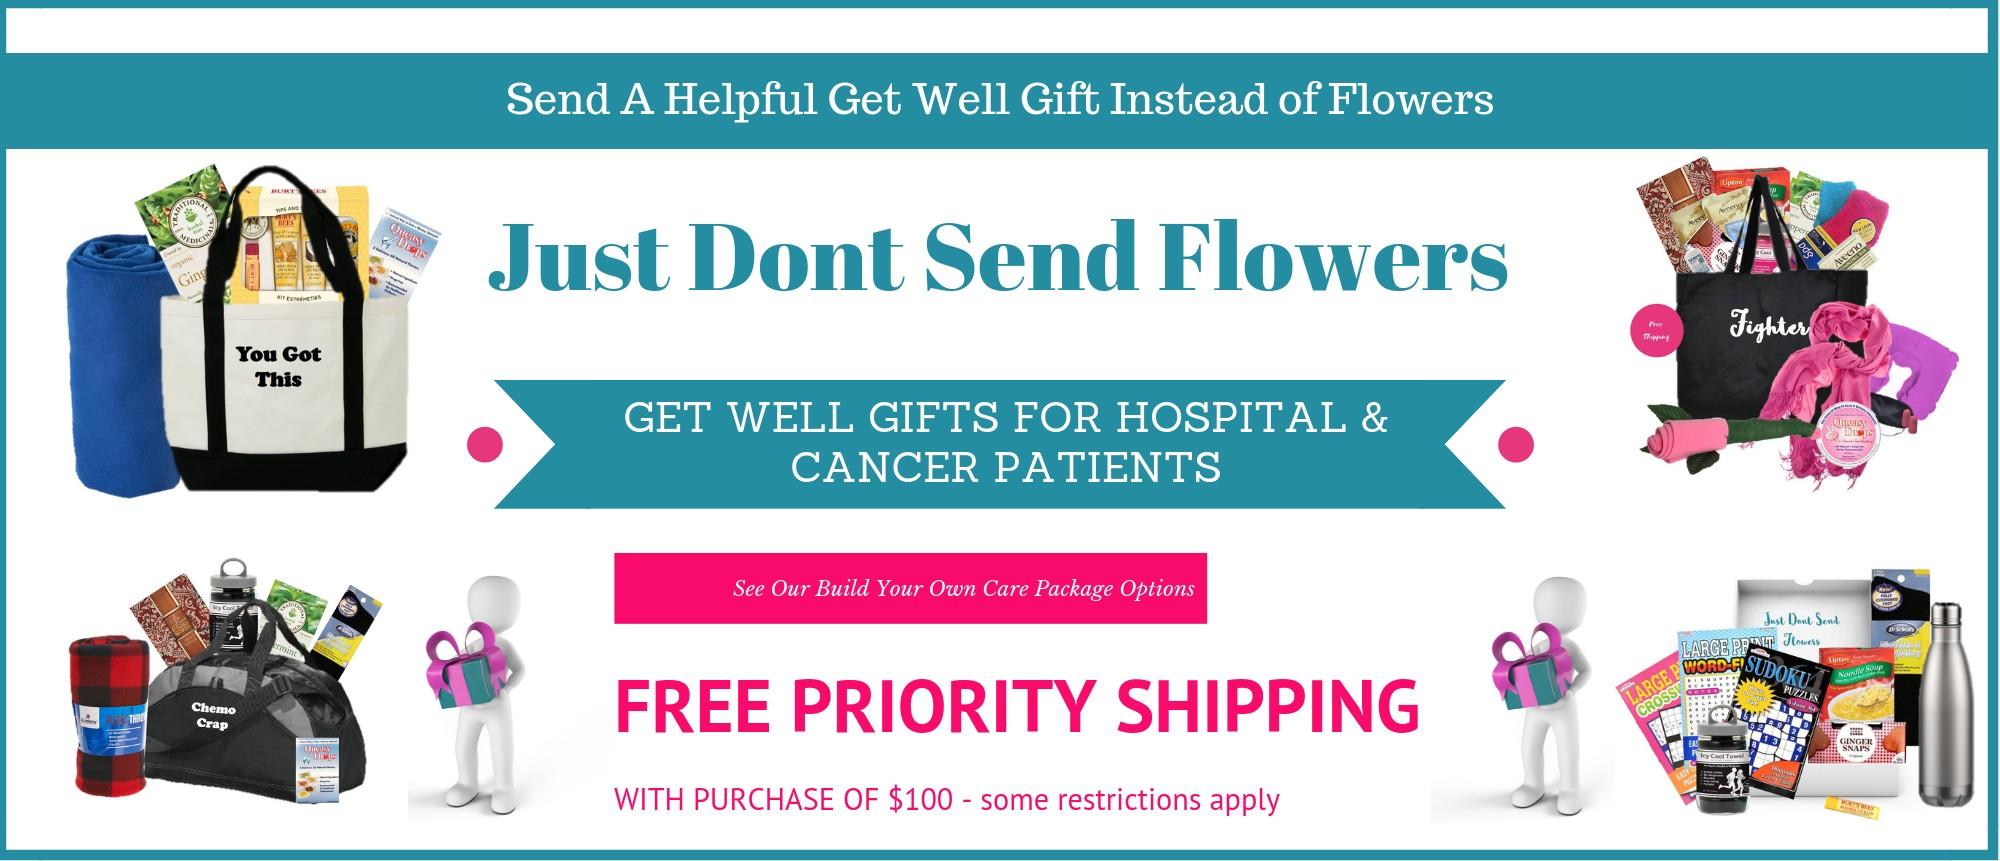 Just Dont Send Flowers | LinkedIn